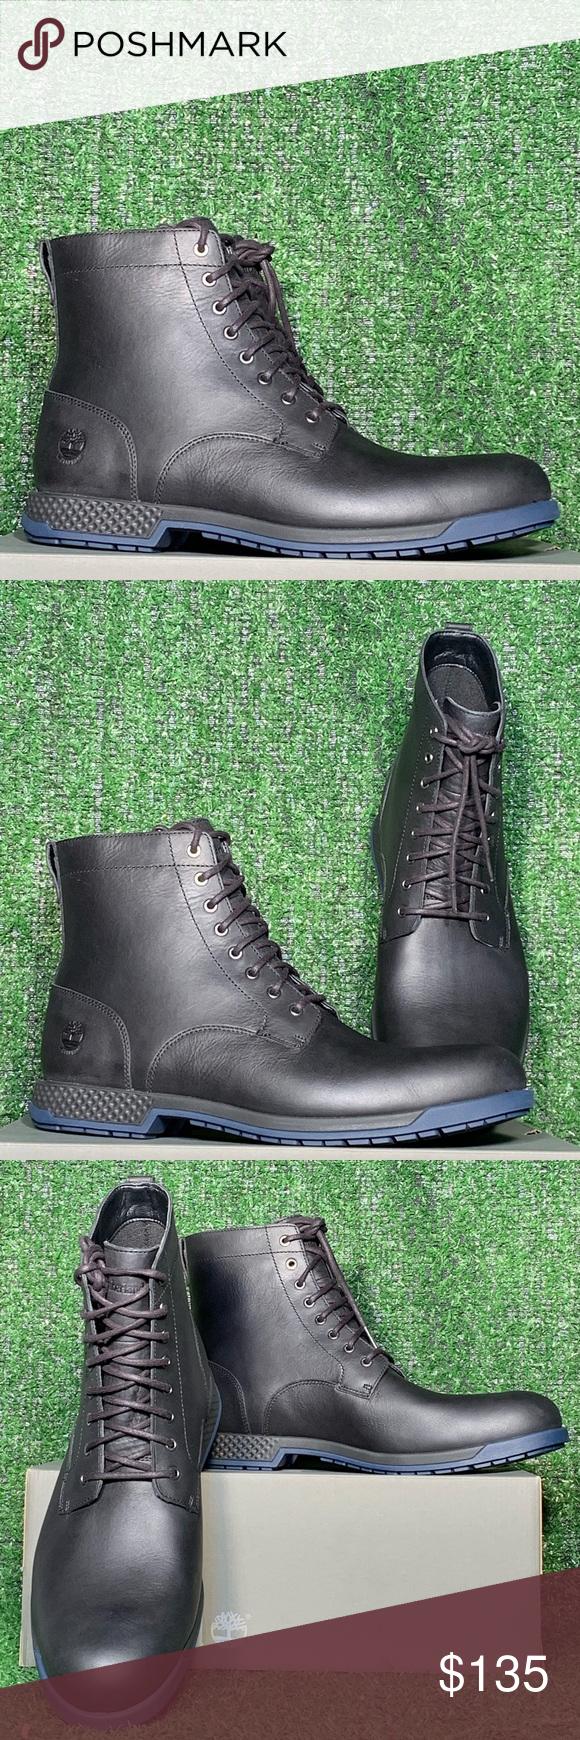 Waterproof boots, Timberland mens